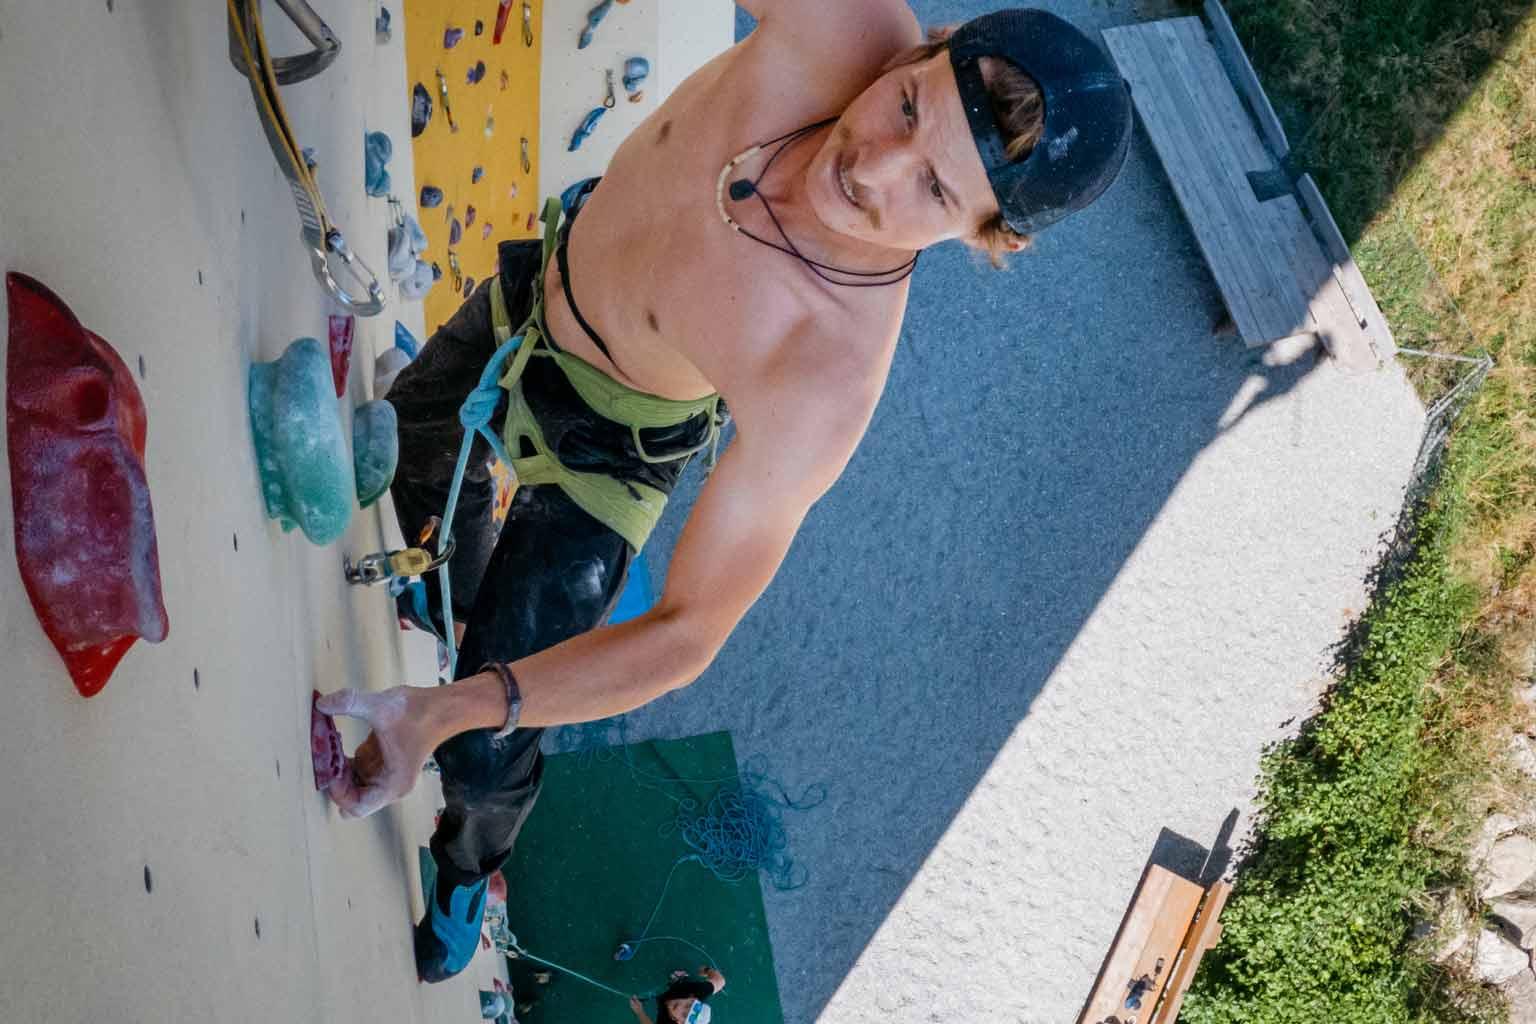 climb and boulder in austria